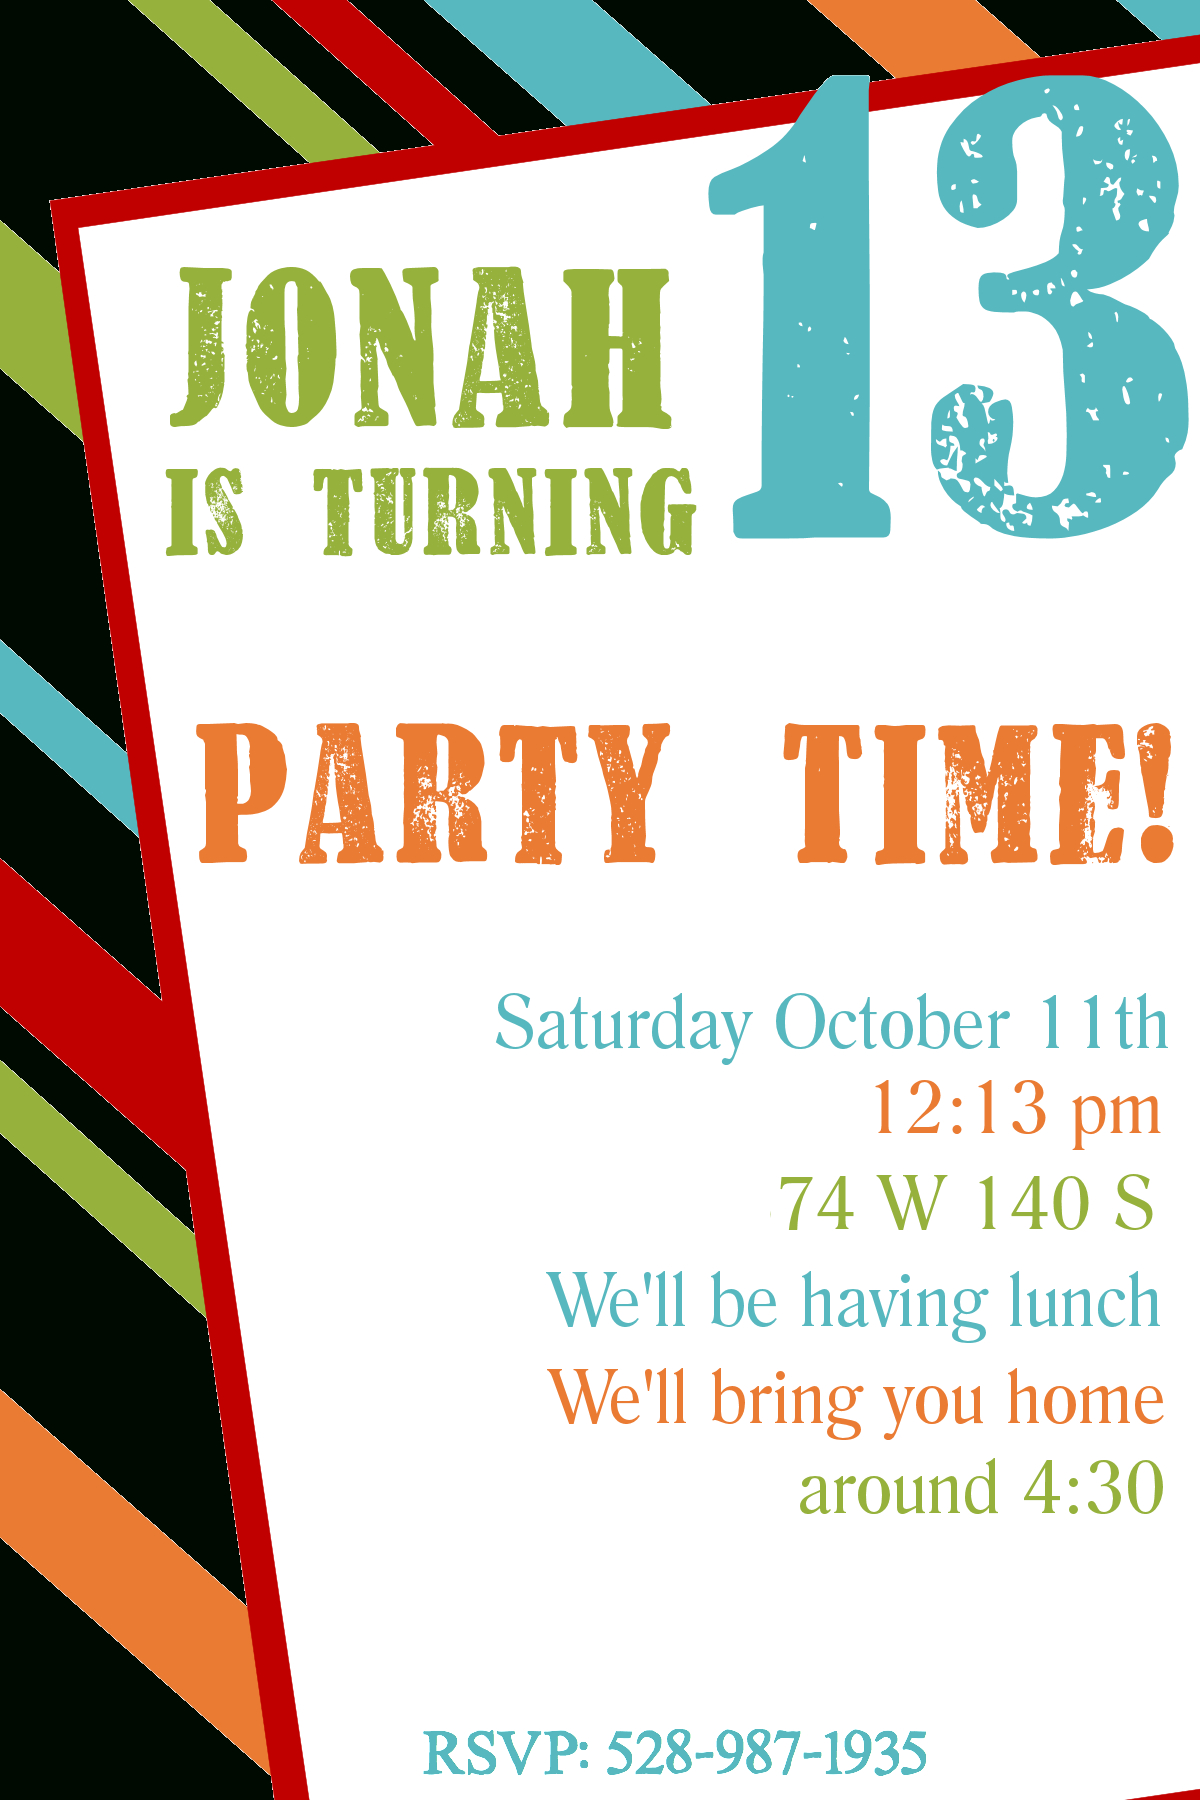 Free Printable Birthday Invites For Boys Party - Kaza.psstech.co - Free Printable Kids Birthday Cards Boys